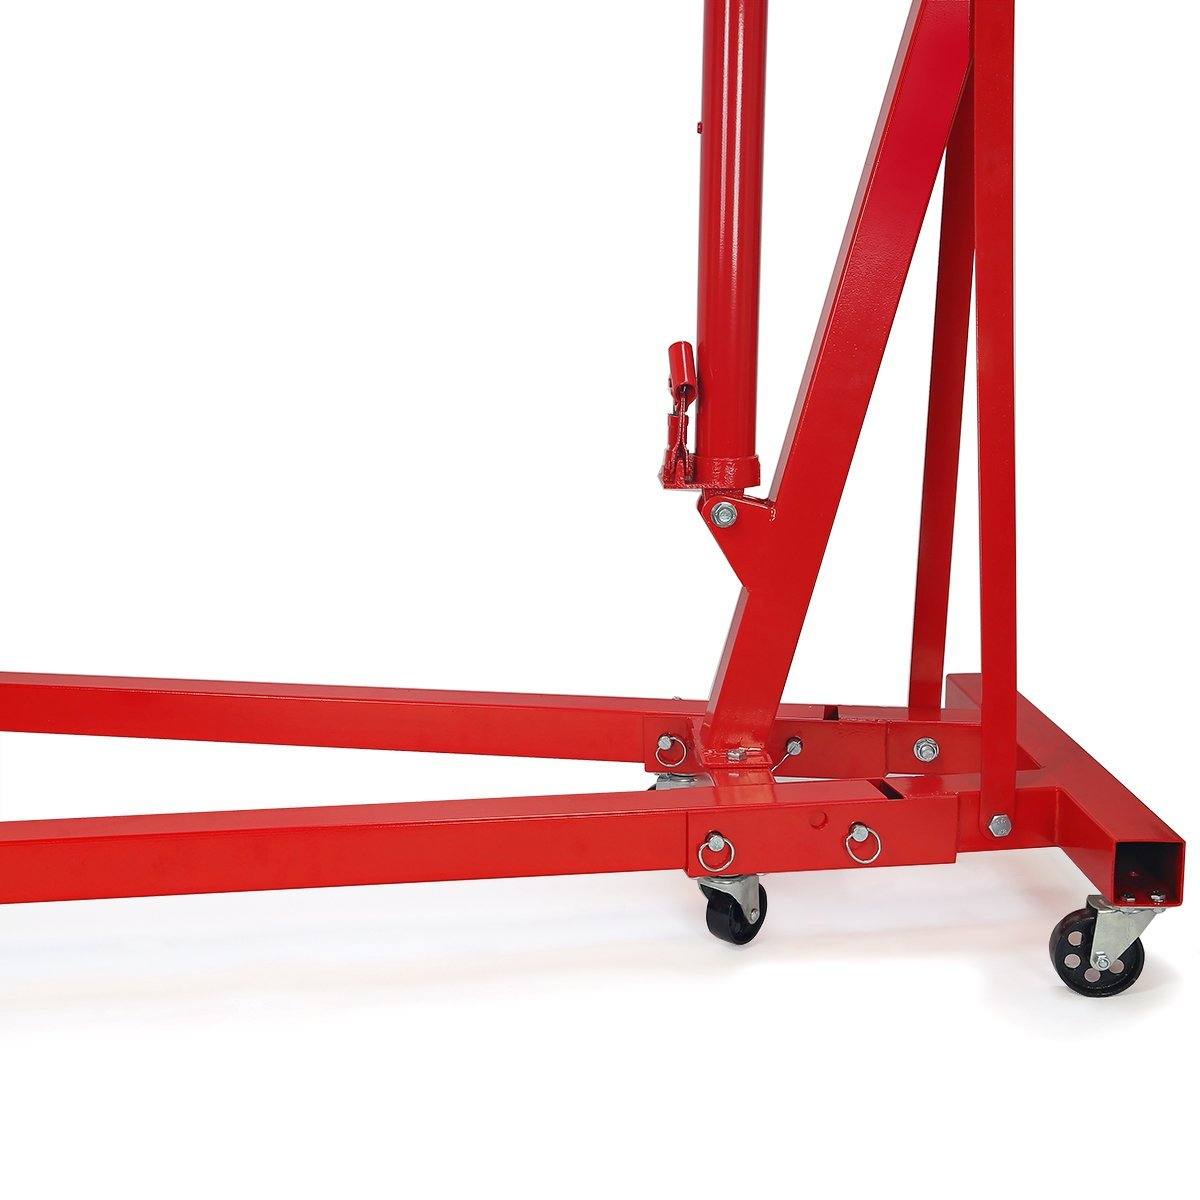 Cherry Picker Lift : Stkusa ton cherry picker engine hoist knockoutengine